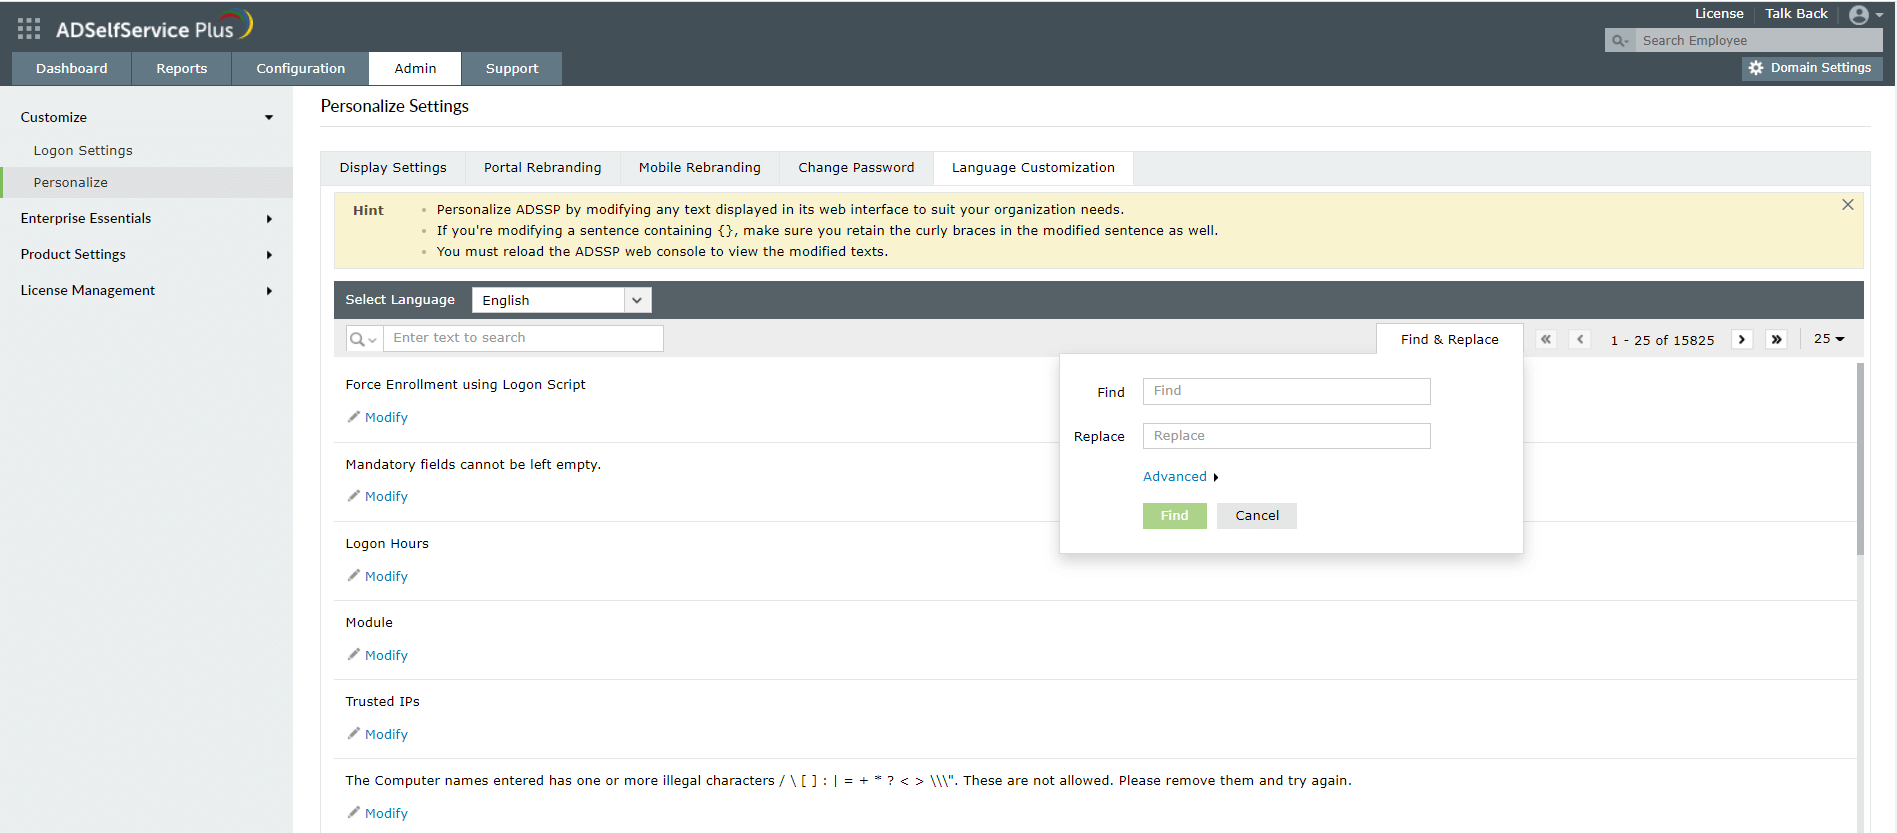 adselfservice-plus-text-customization-admin-guide-3